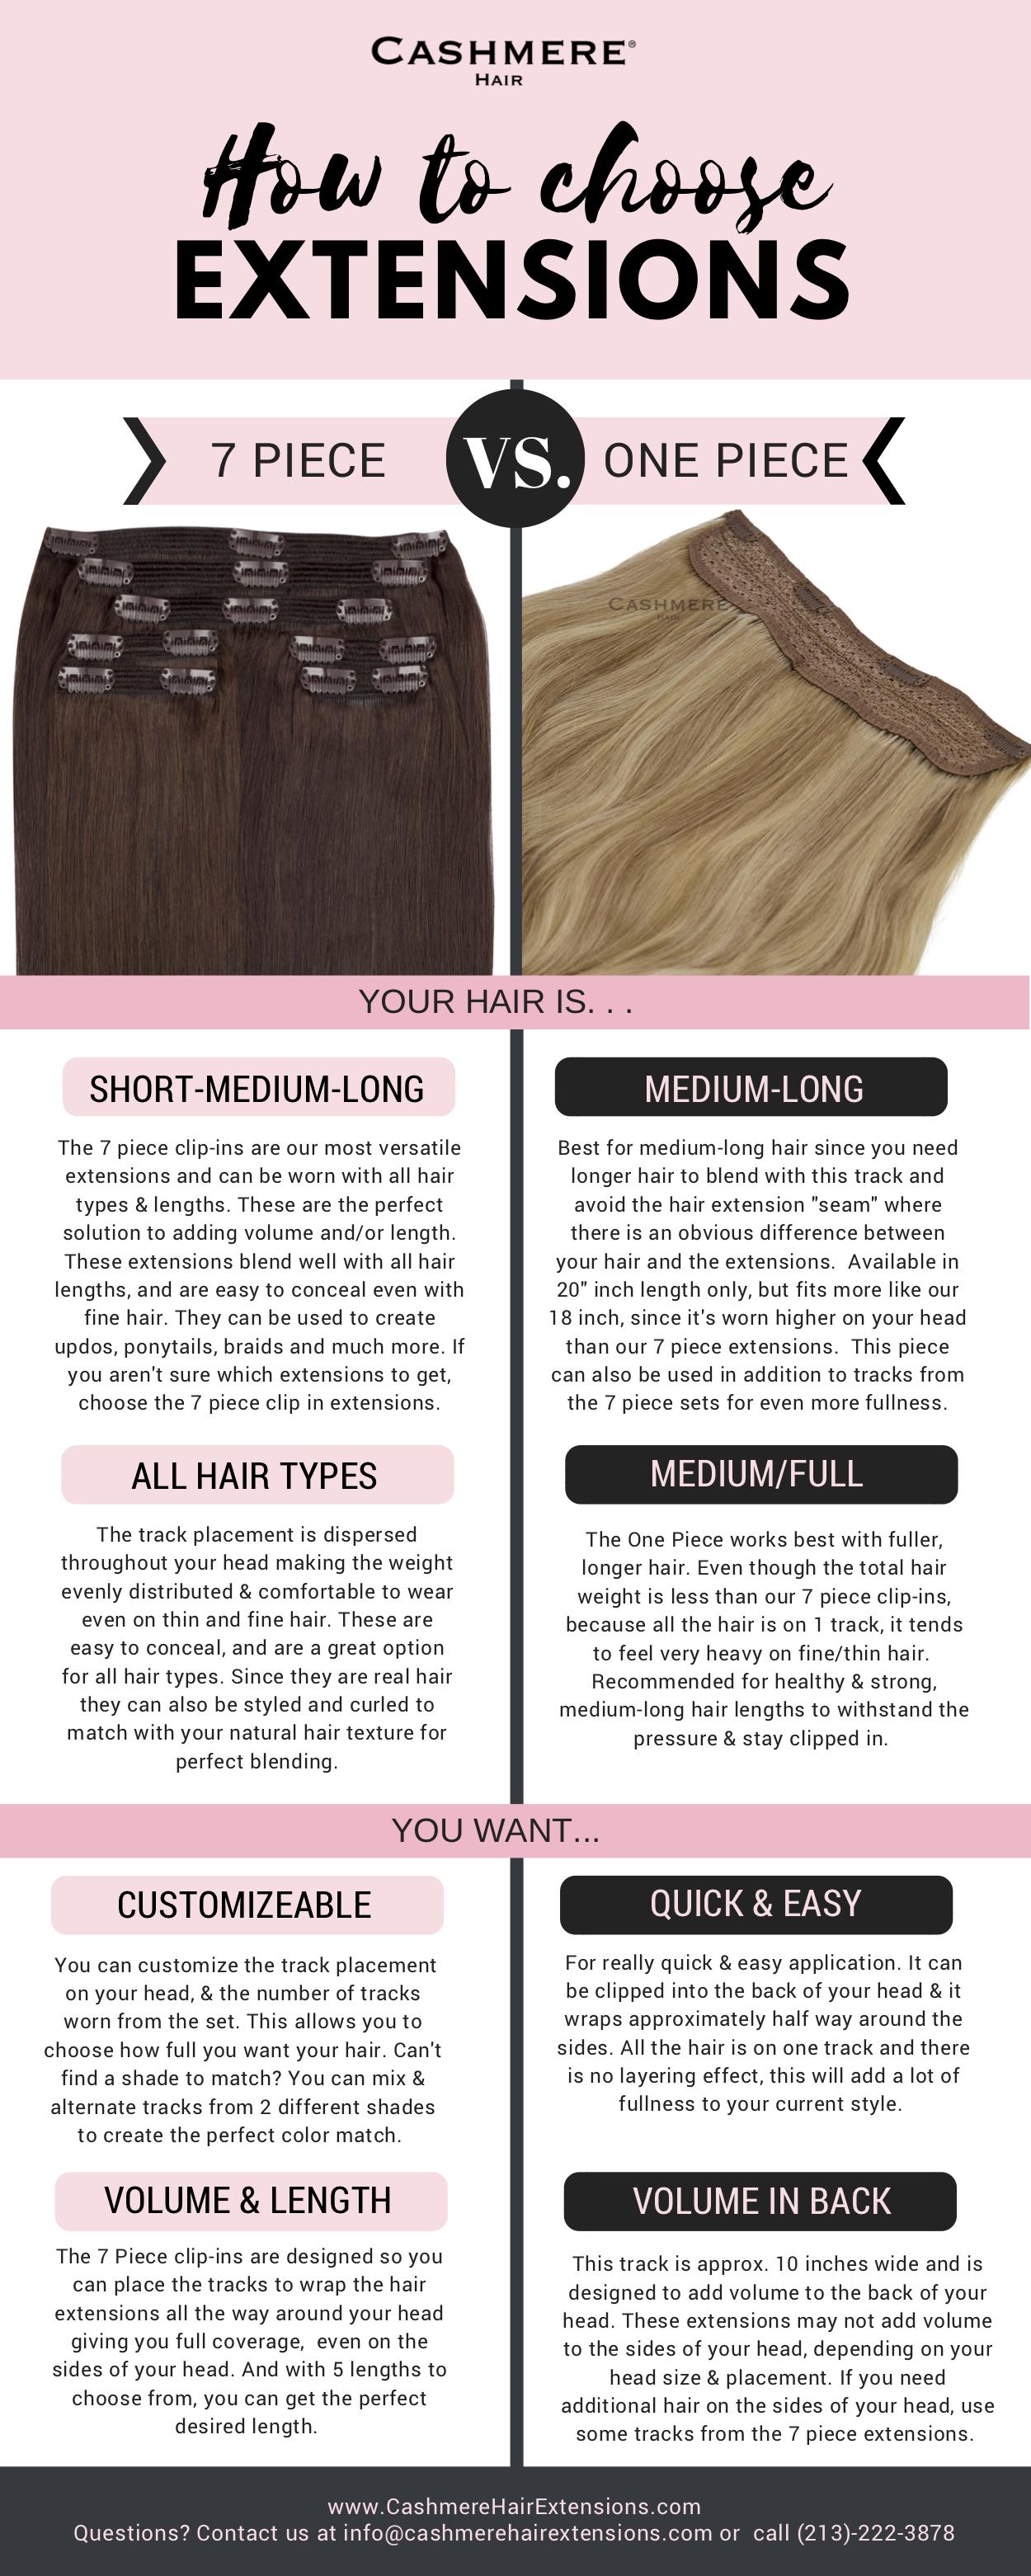 CLIP IIN HAIR EXTENSIONS CASHMERE HAIR